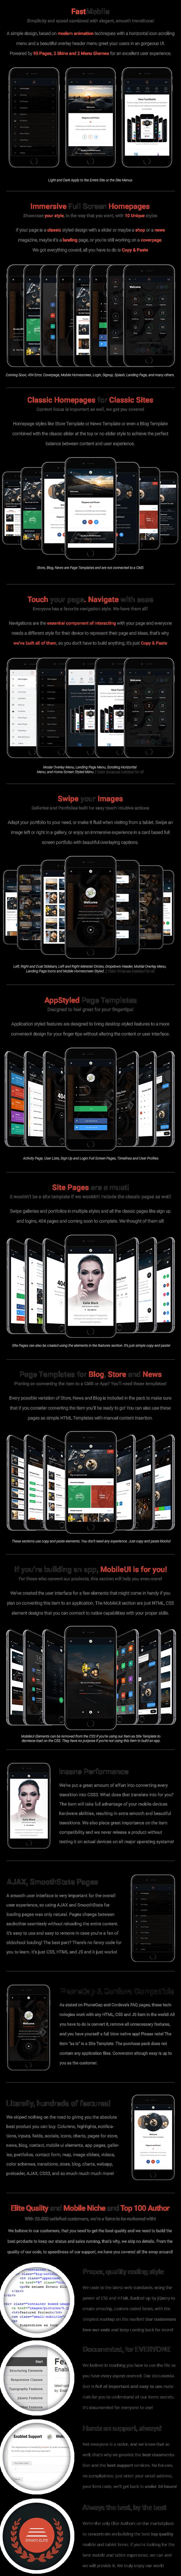 Fast Mobile | Mobile Template - 8